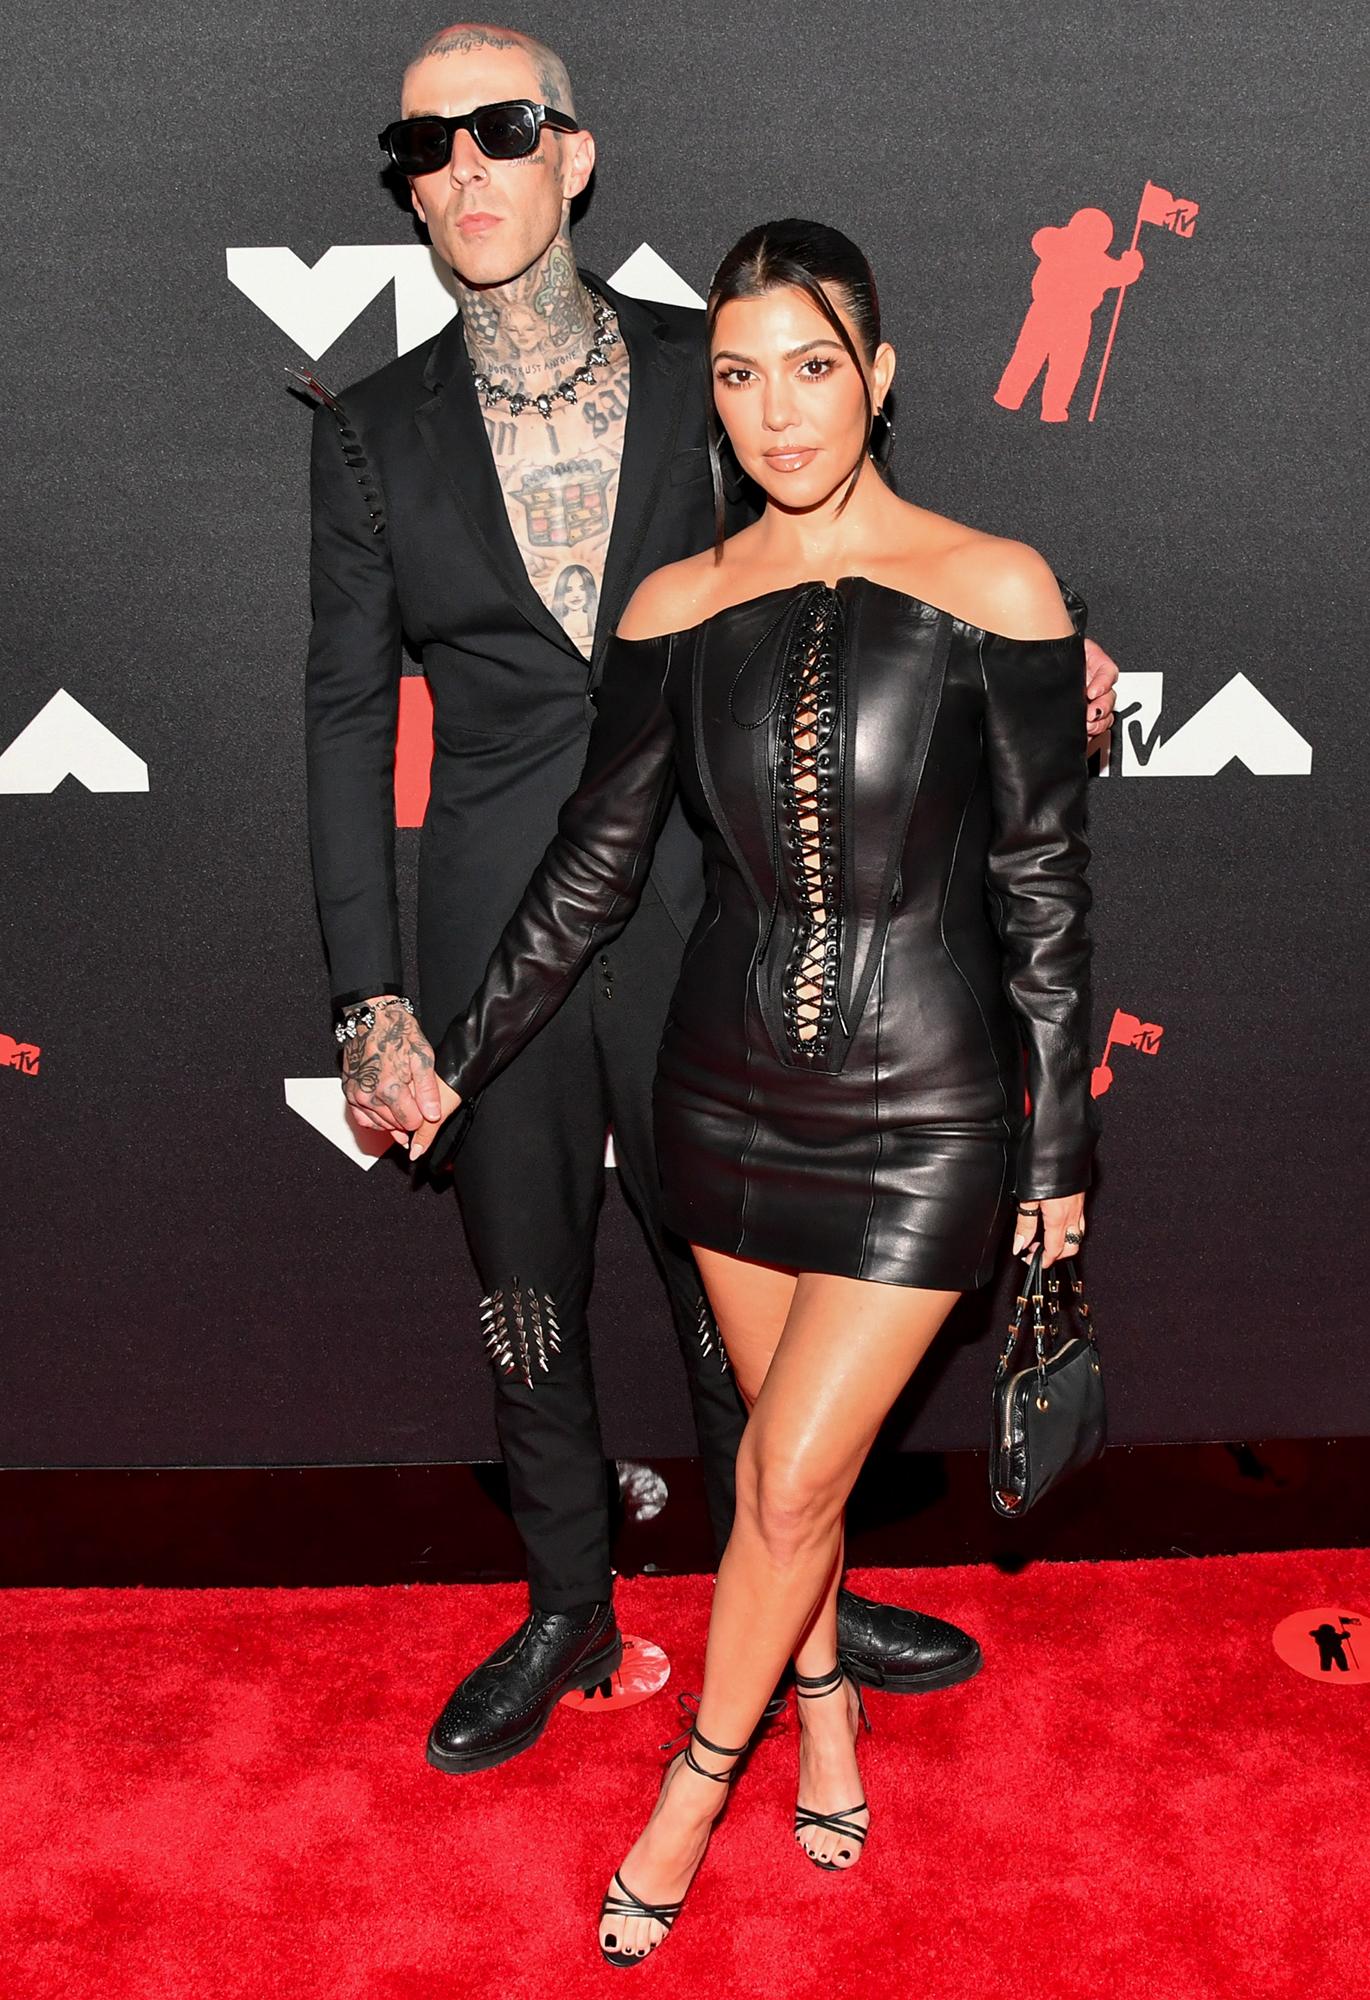 Travis Barker and Kourtney Kardashian arrive at the 2021 MTV Video Music Awards